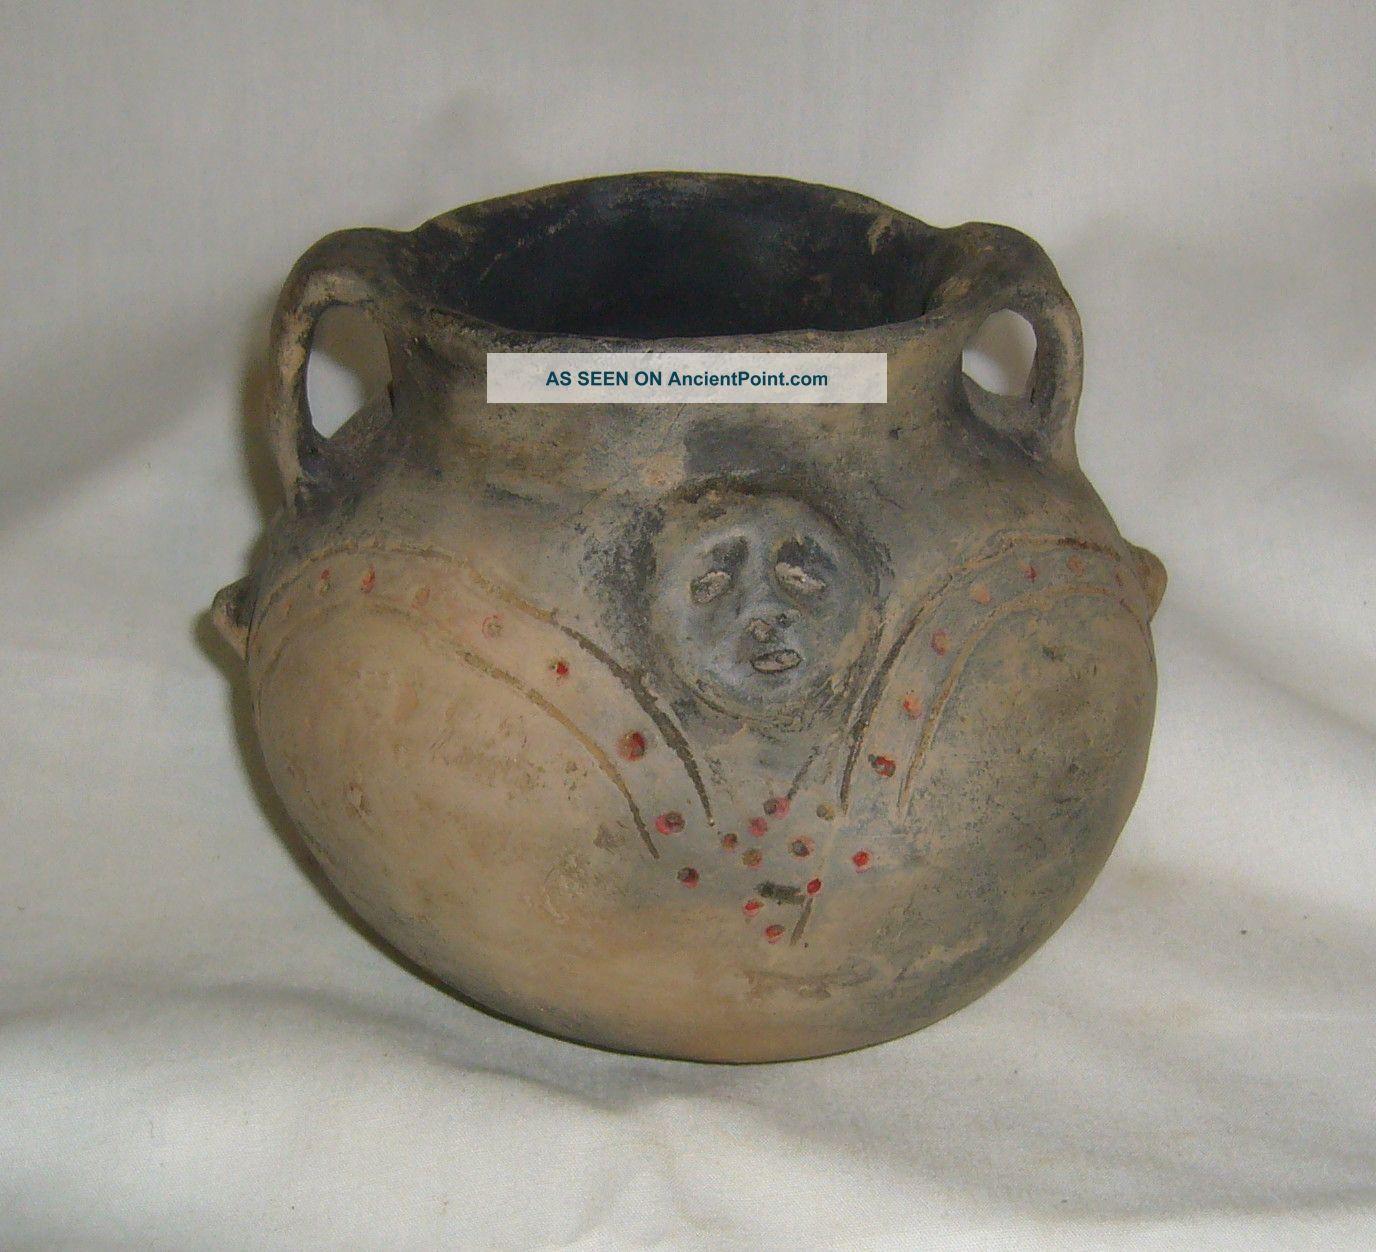 Antique Native American Mississippi Cultural Sphere Primitive Strap Handled Jar Native American photo